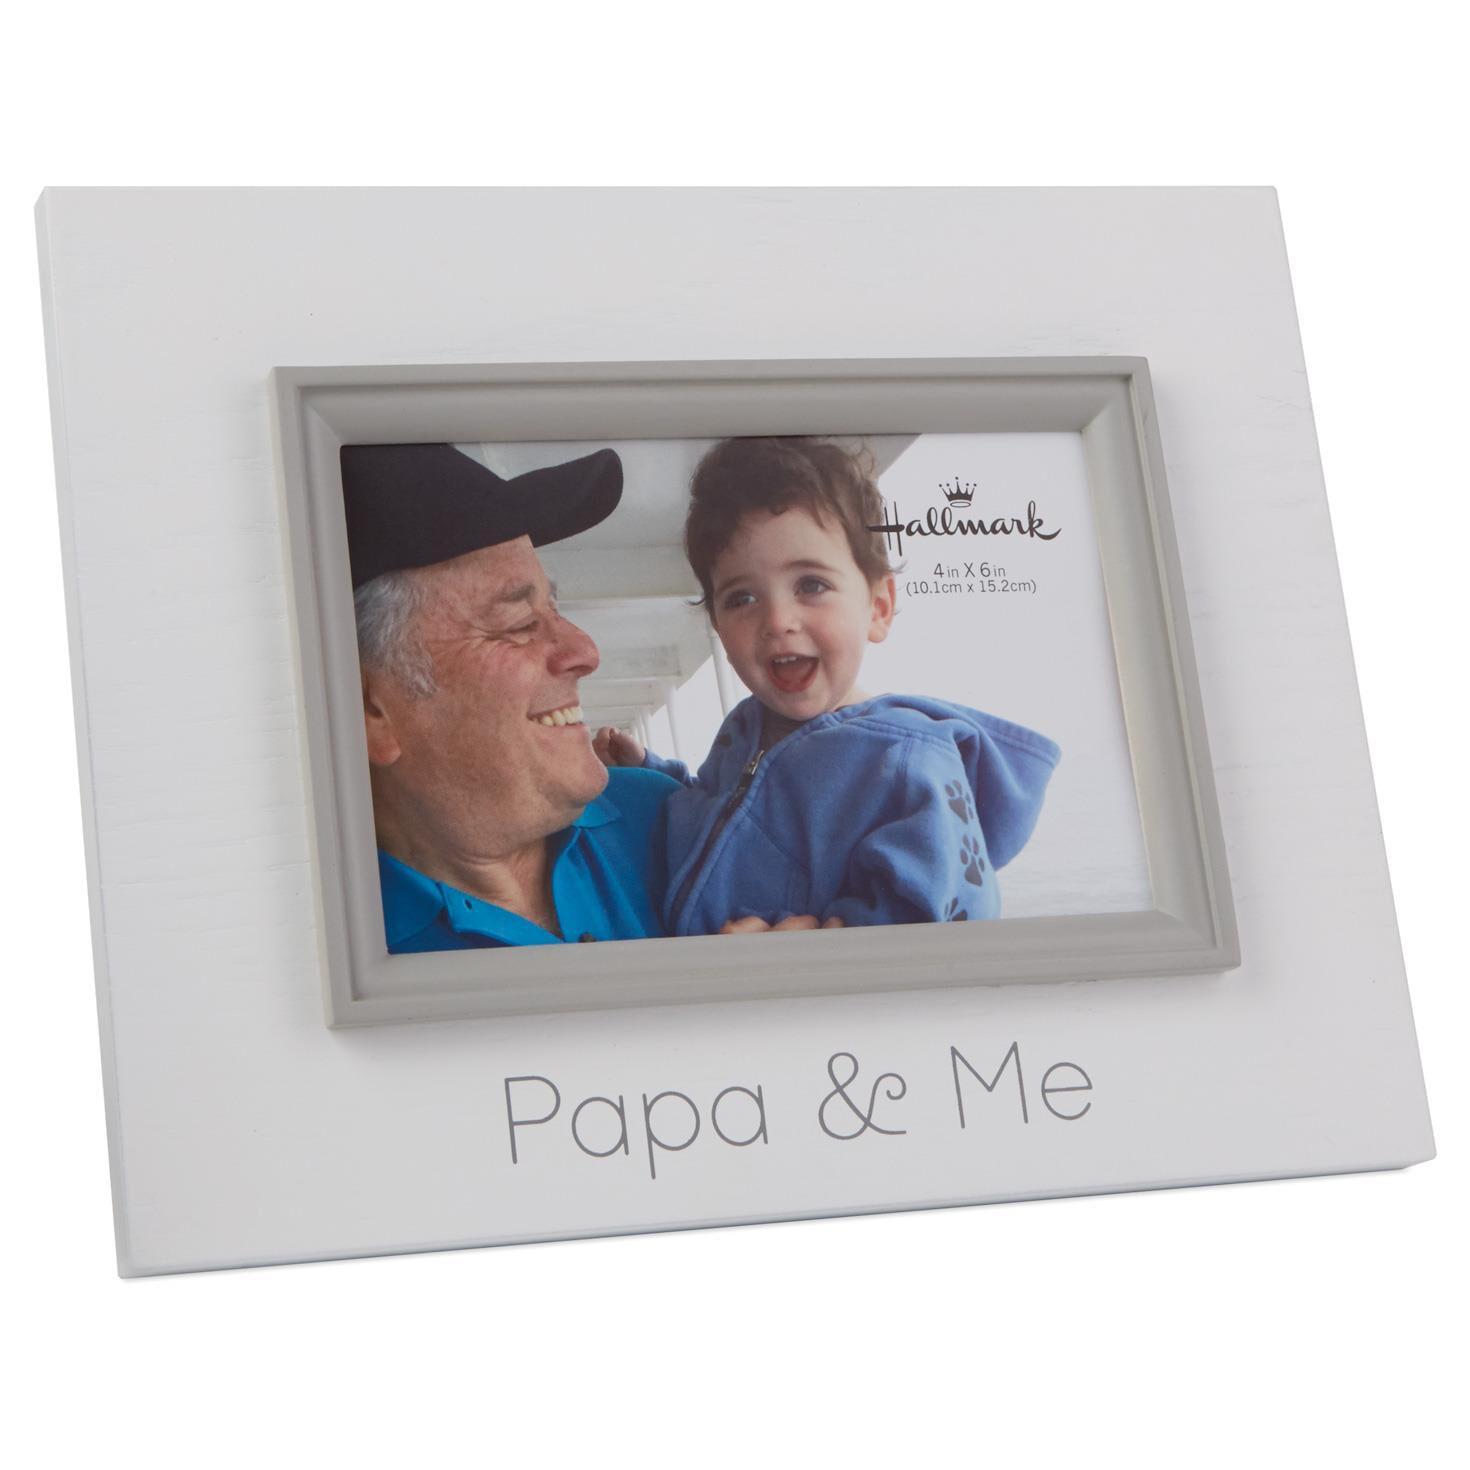 Papa & Me Wood Photo Frame, 4x6 - Picture Frames - Hallmark